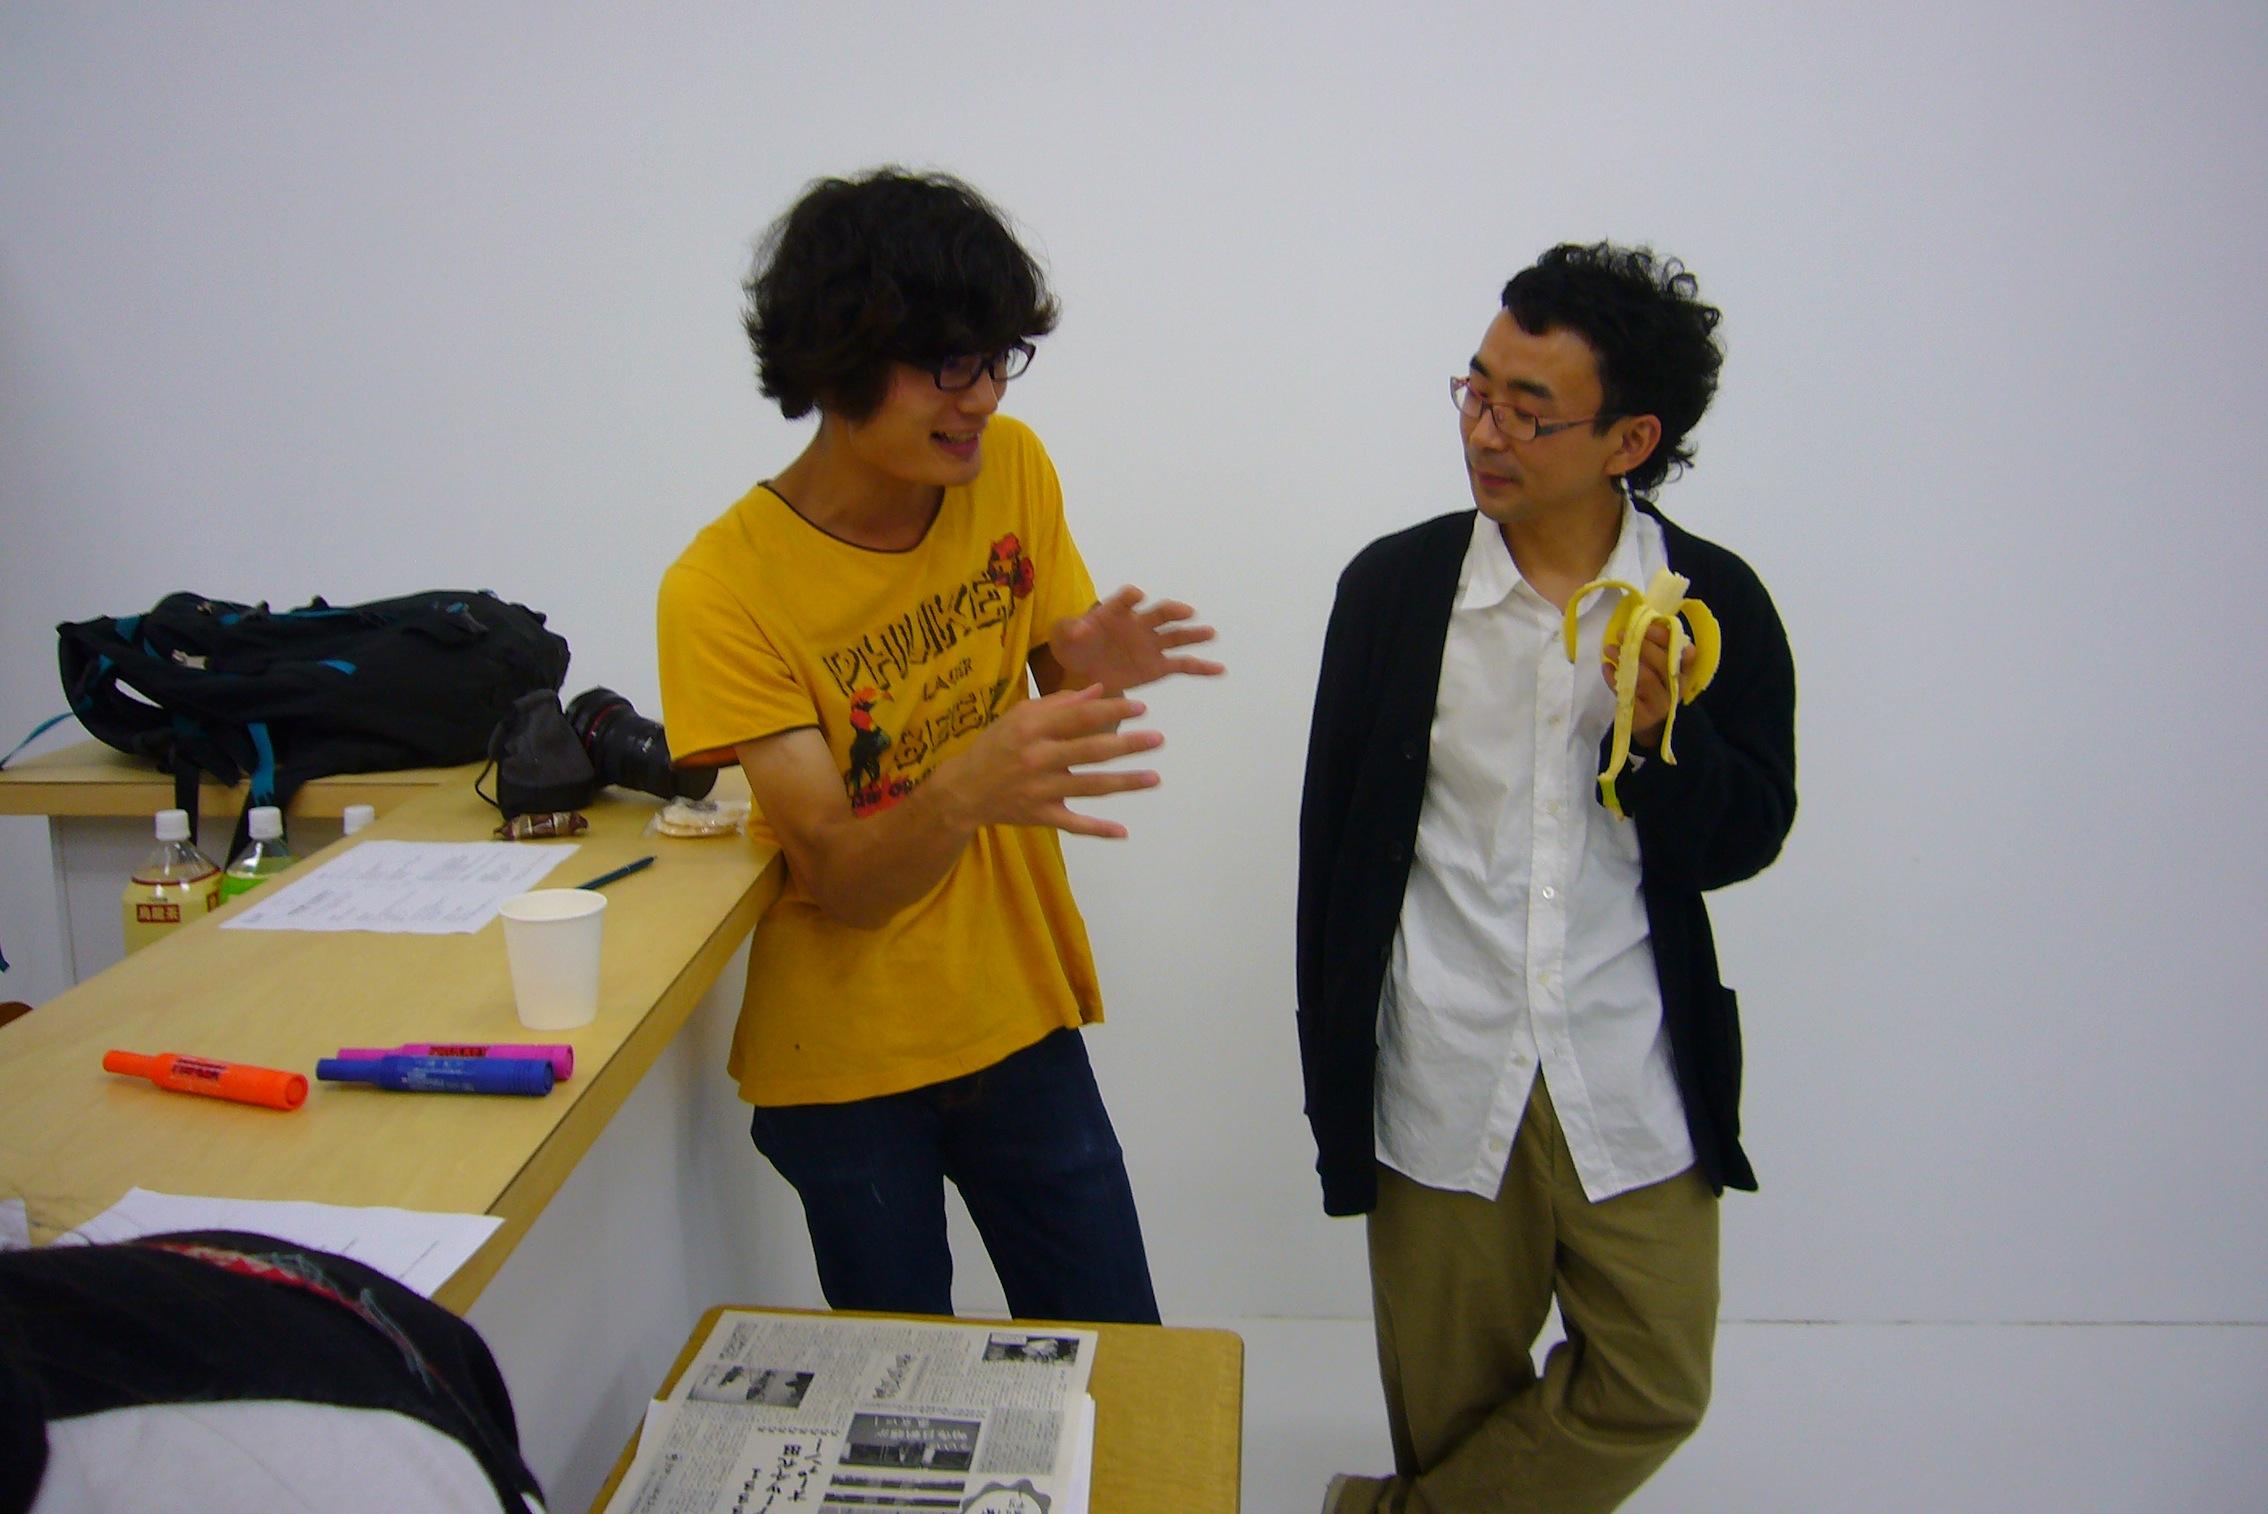 http://blog.3331.jp/staff/file/P1030428.JPG